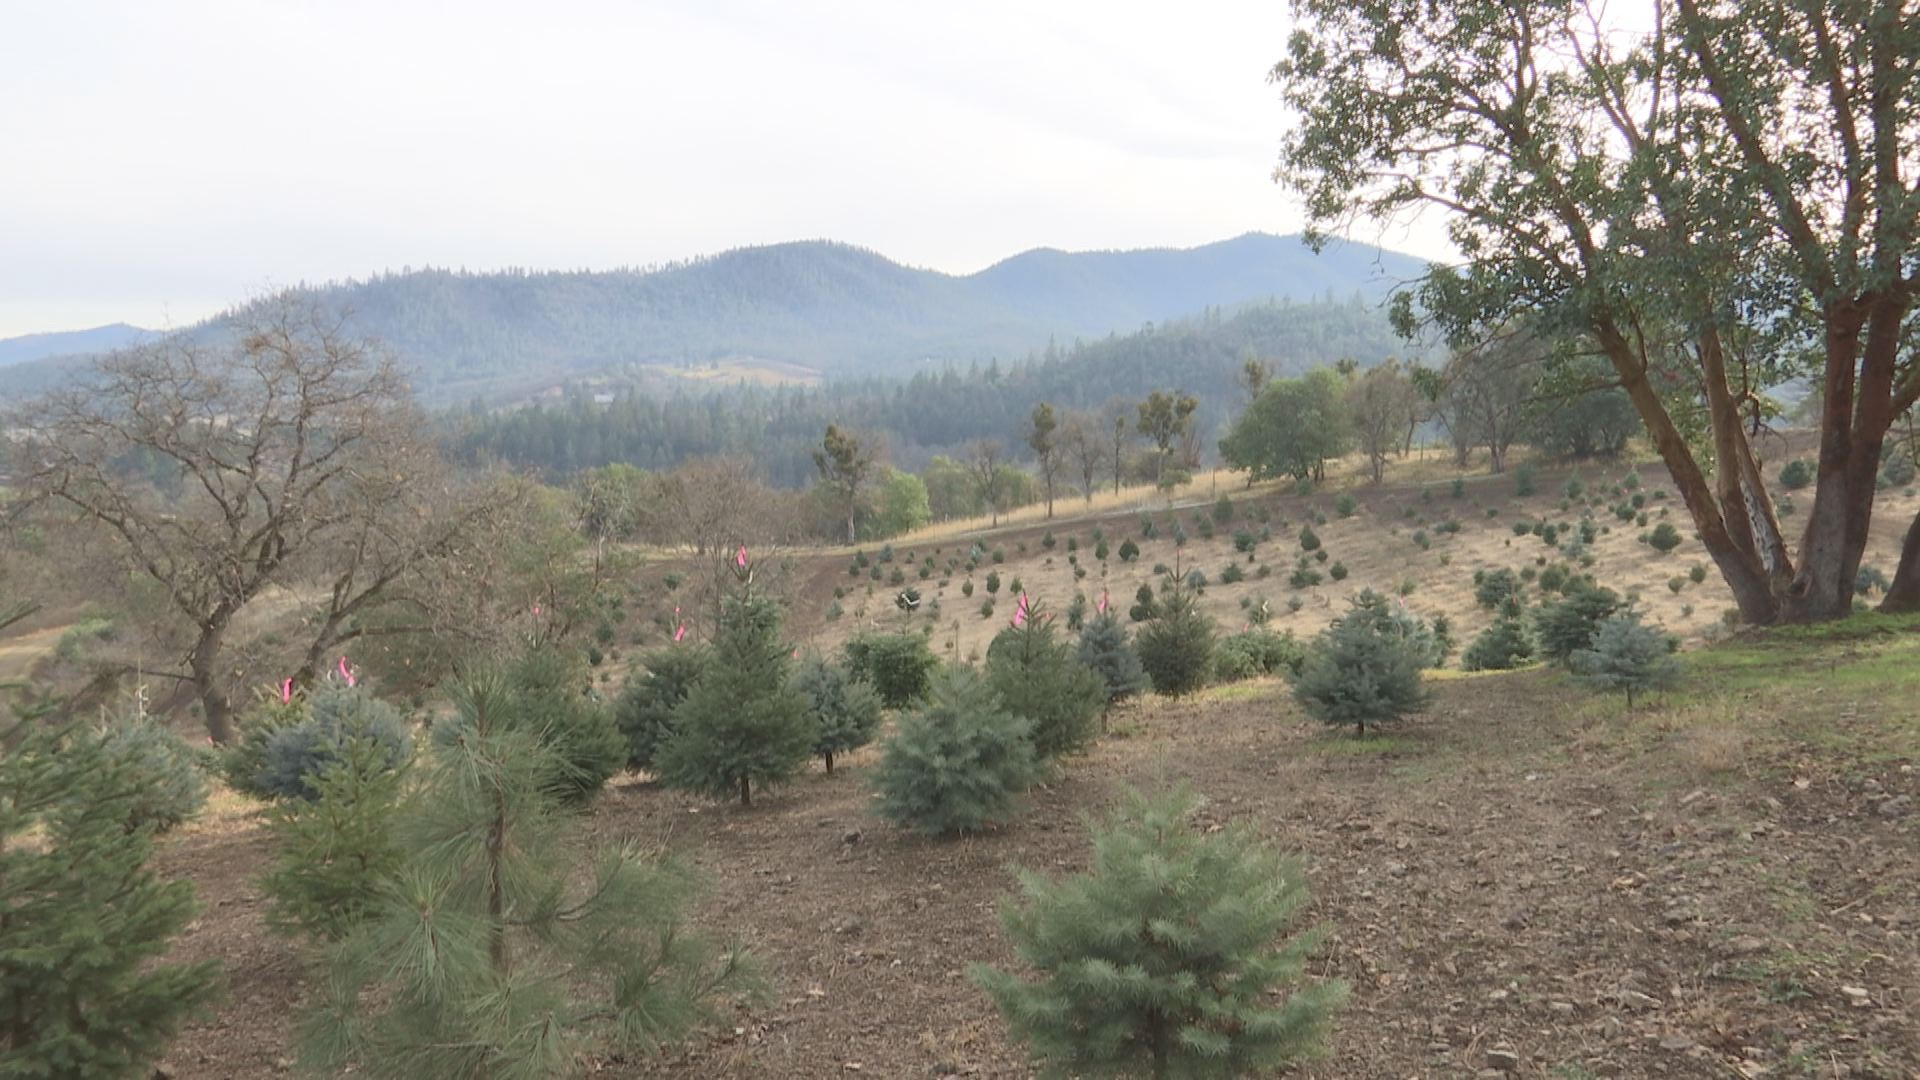 Local Tree Farm Managing During Nationwide Christmas Tree